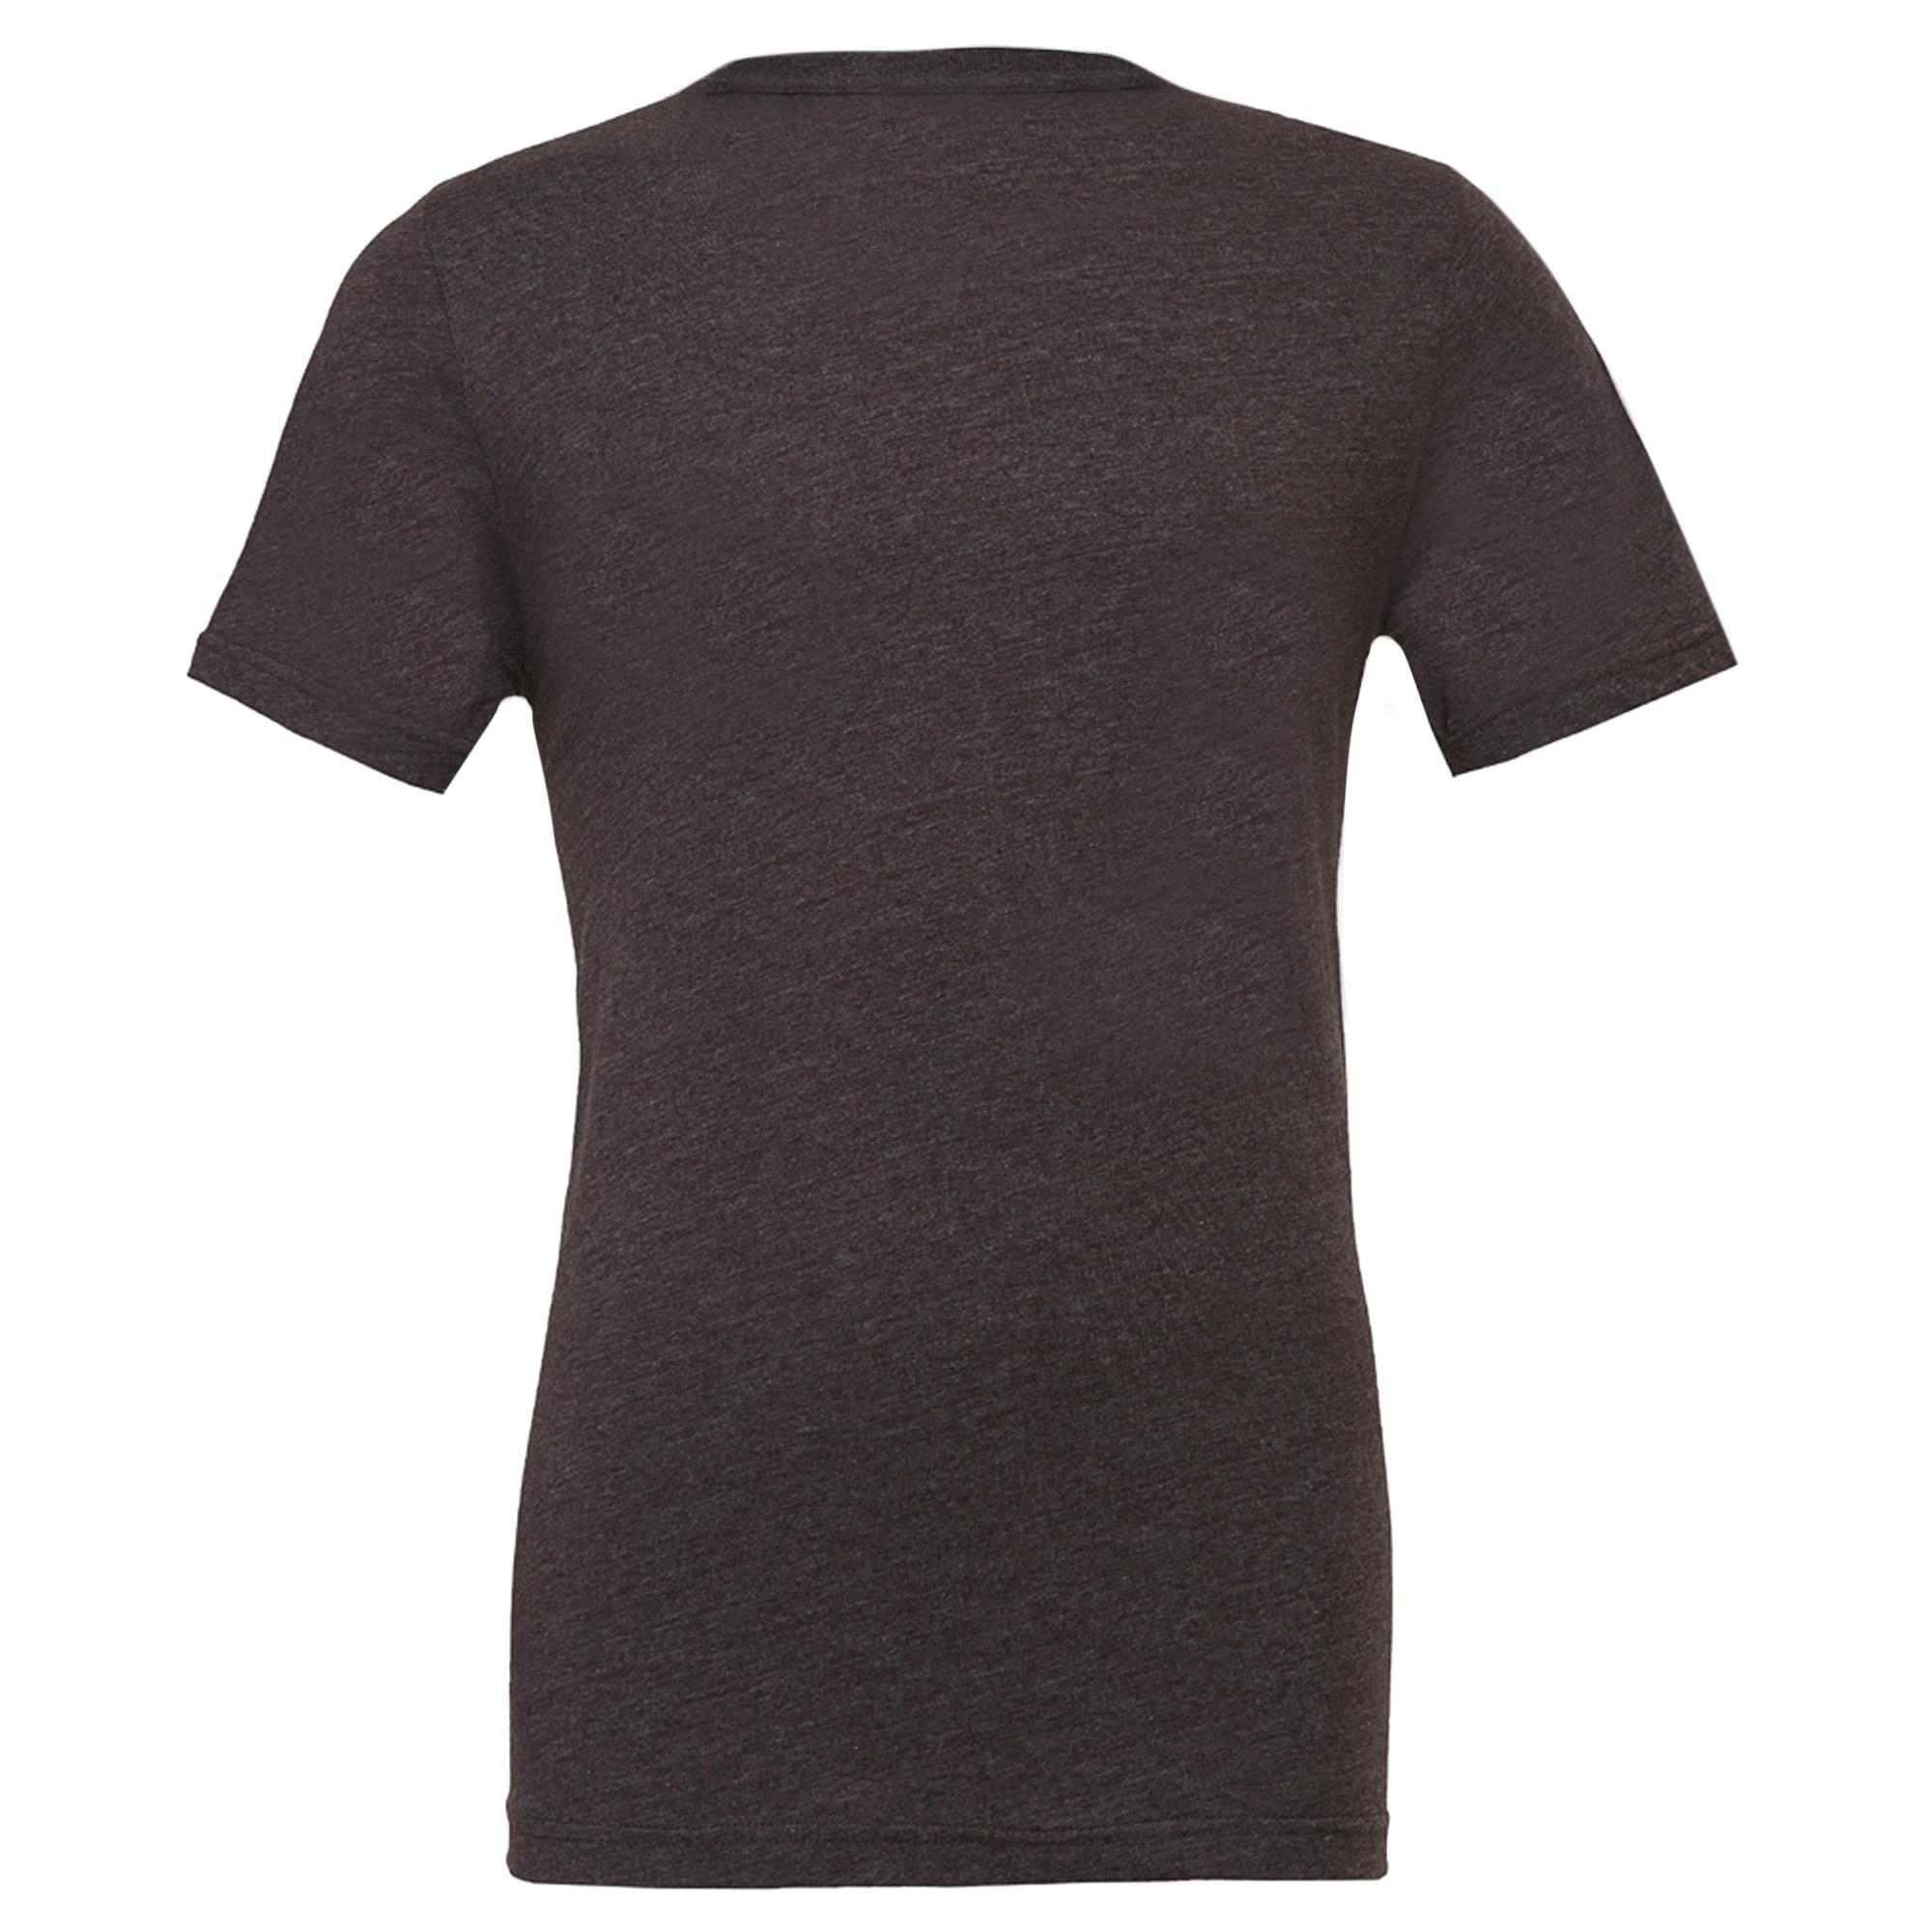 Canvas Unisex Jersey Crew Neck T-Shirt / Mens Short Sleeve T-Shirt (M) (Heather Blue)